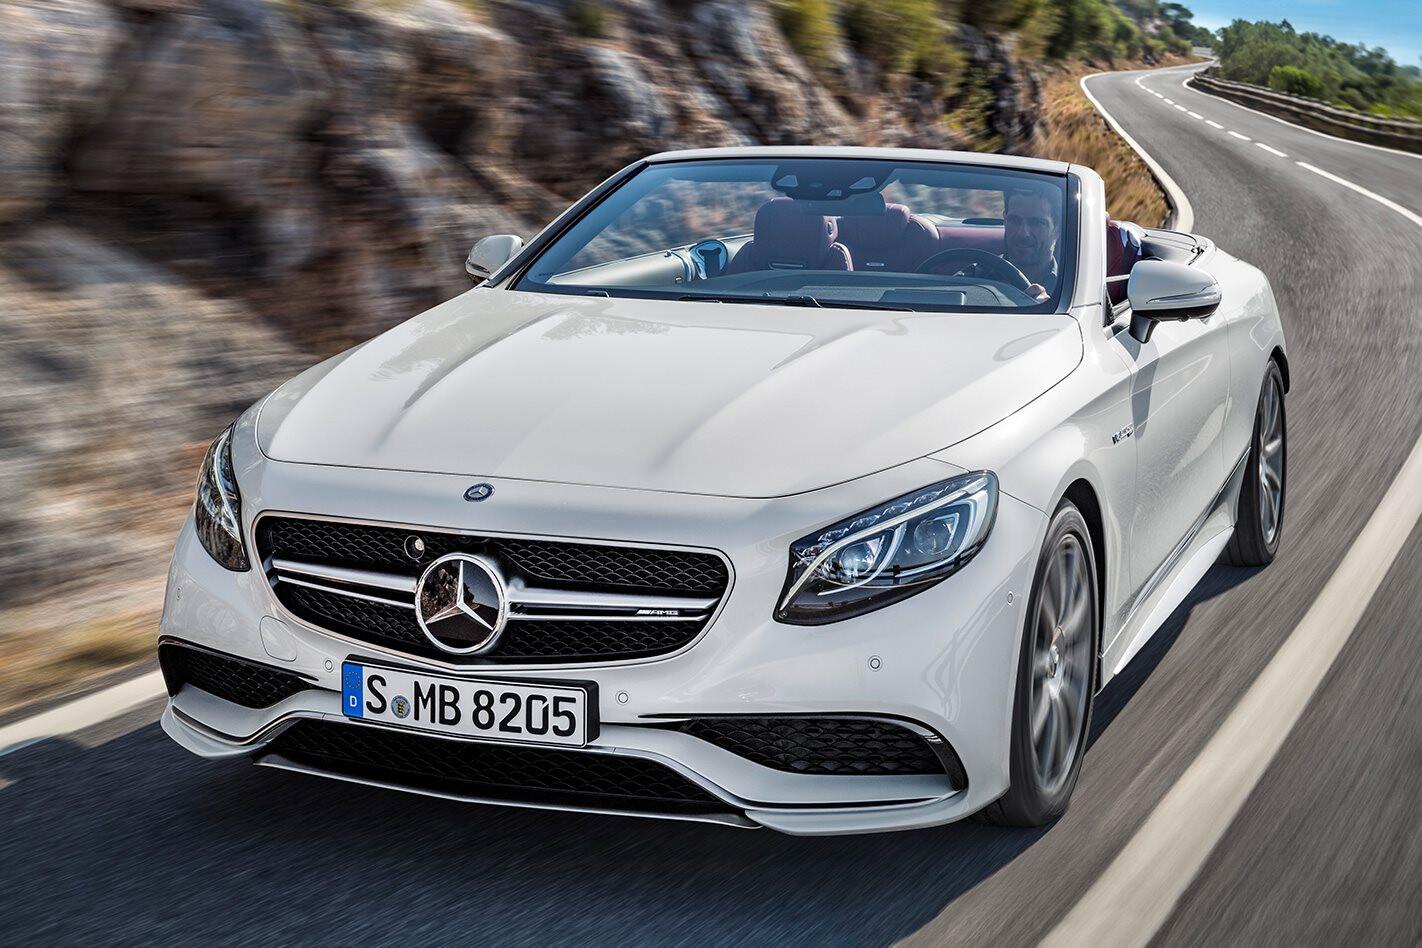 2016 Mercedes-Benz S500 Cabriolet review